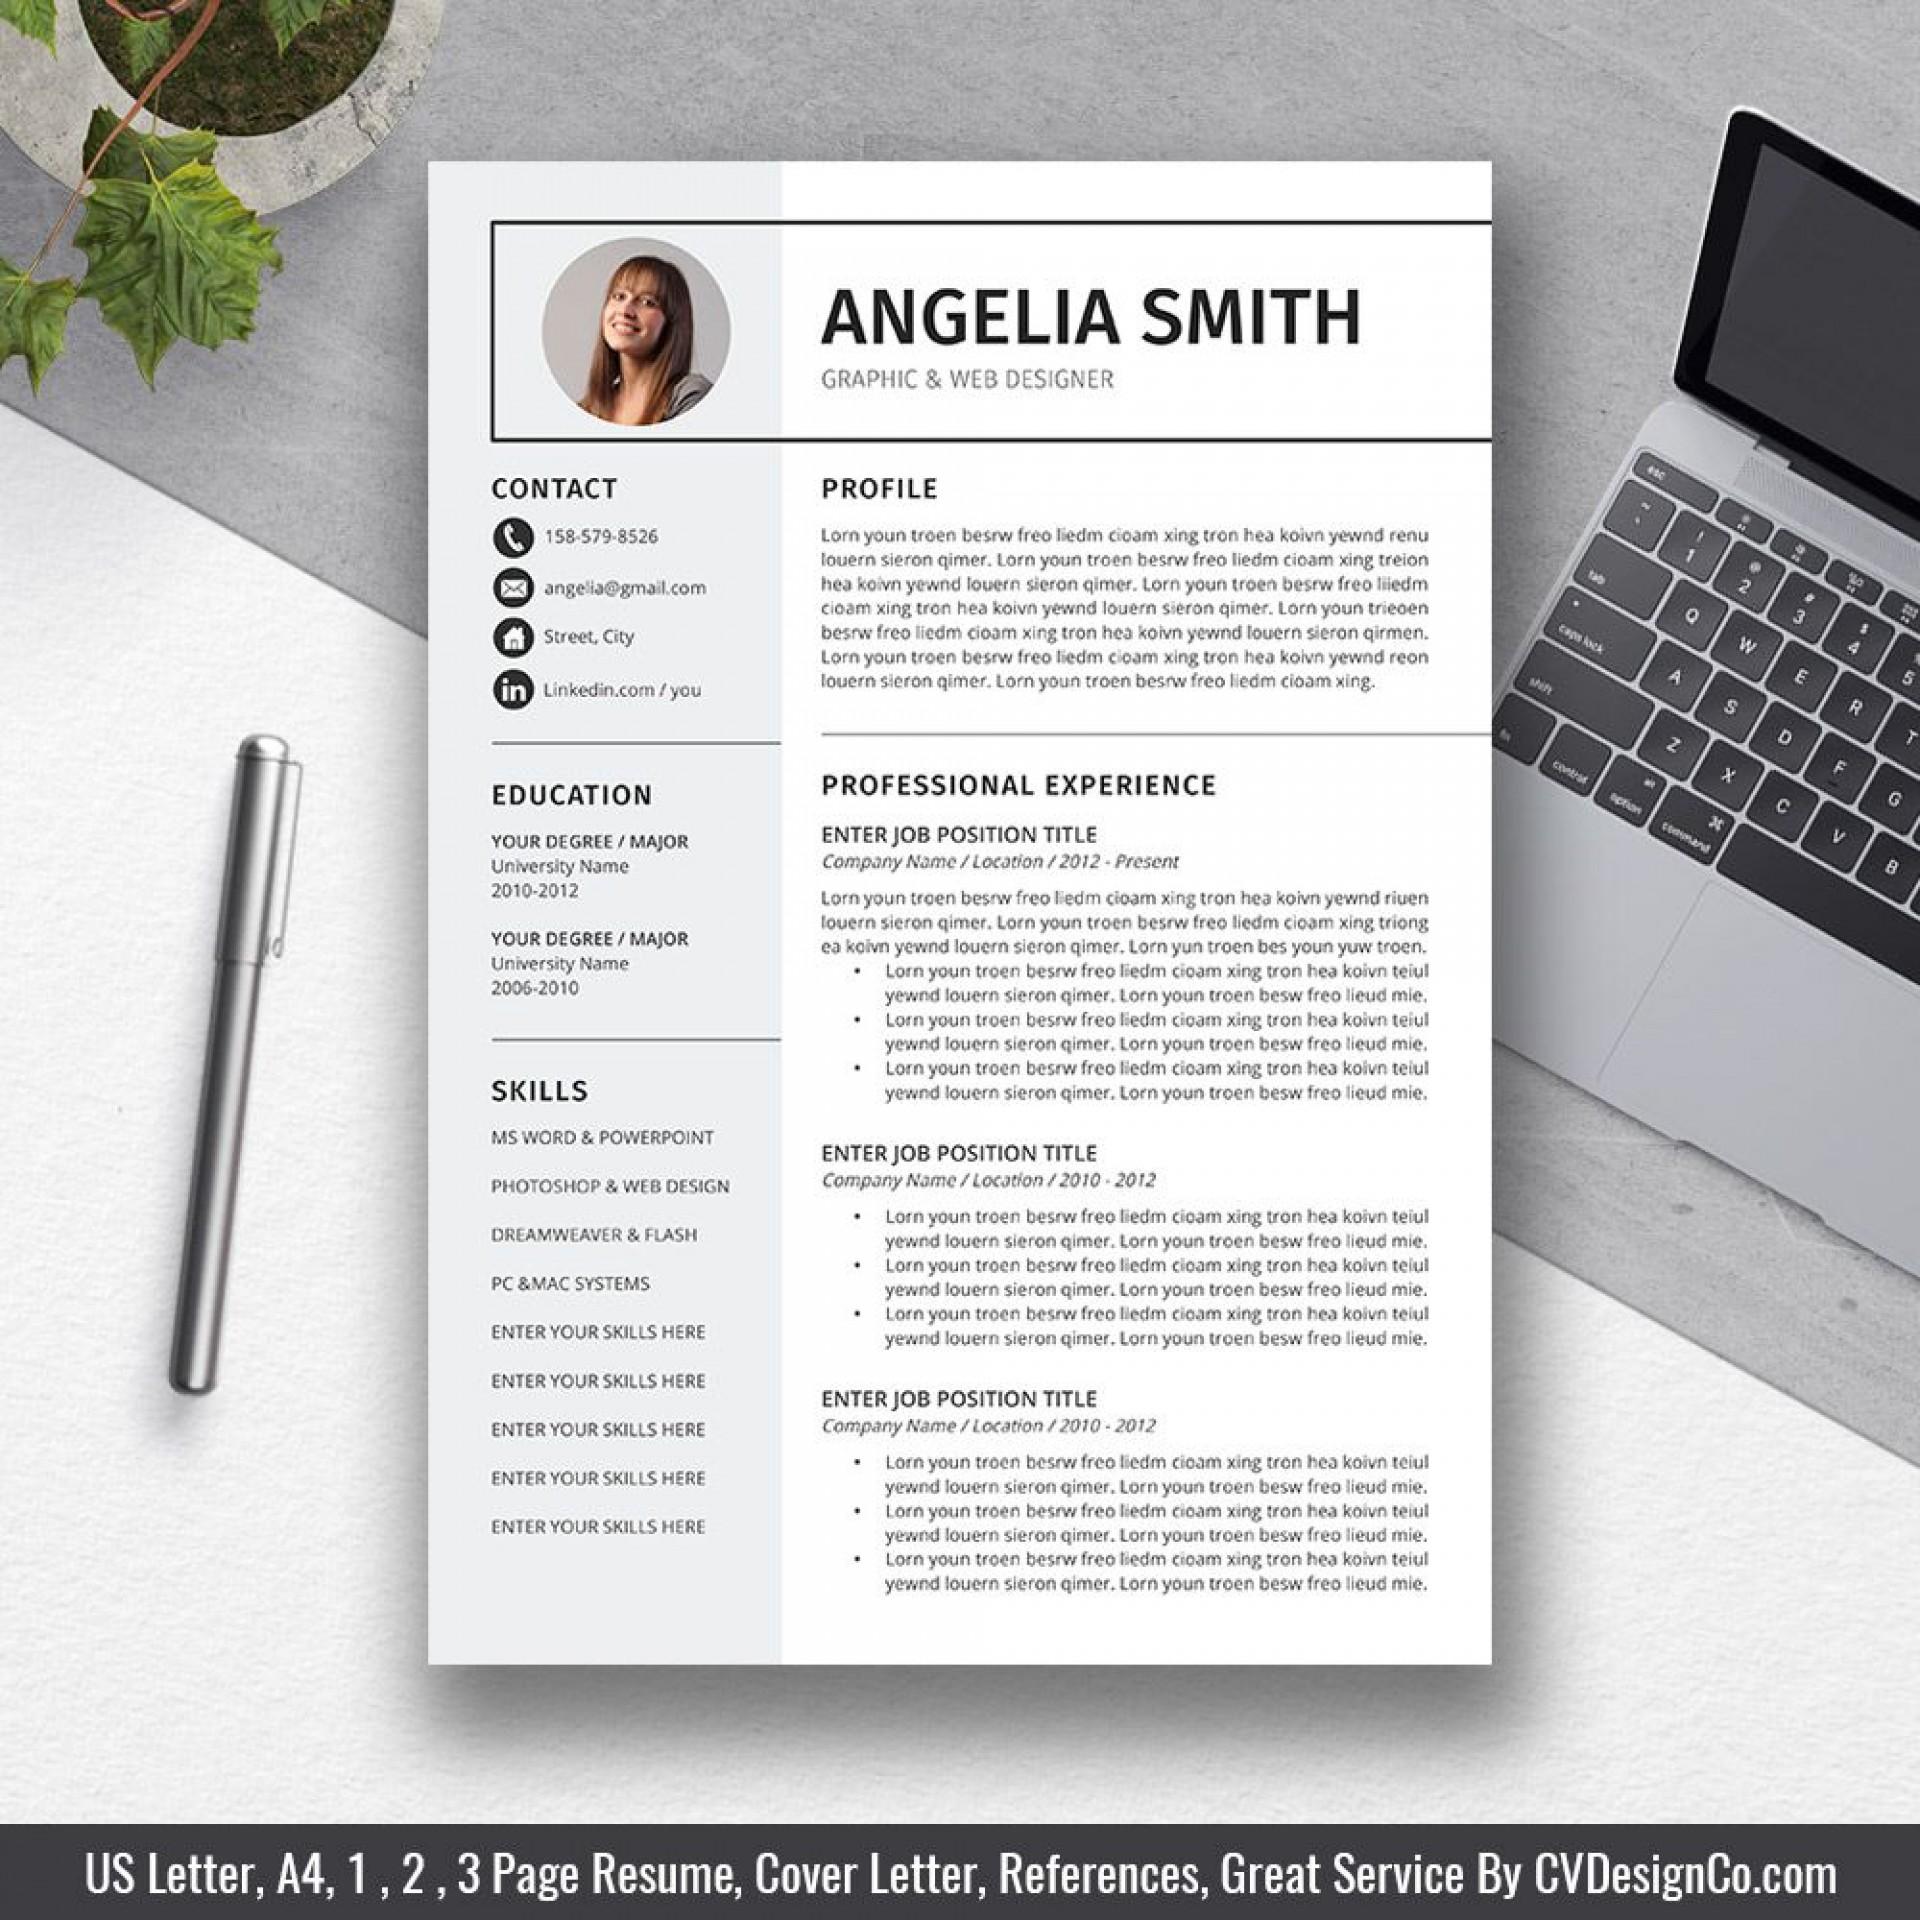 008 Wonderful Word Resume Template Mac Inspiration  2008 Microsoft 20111920